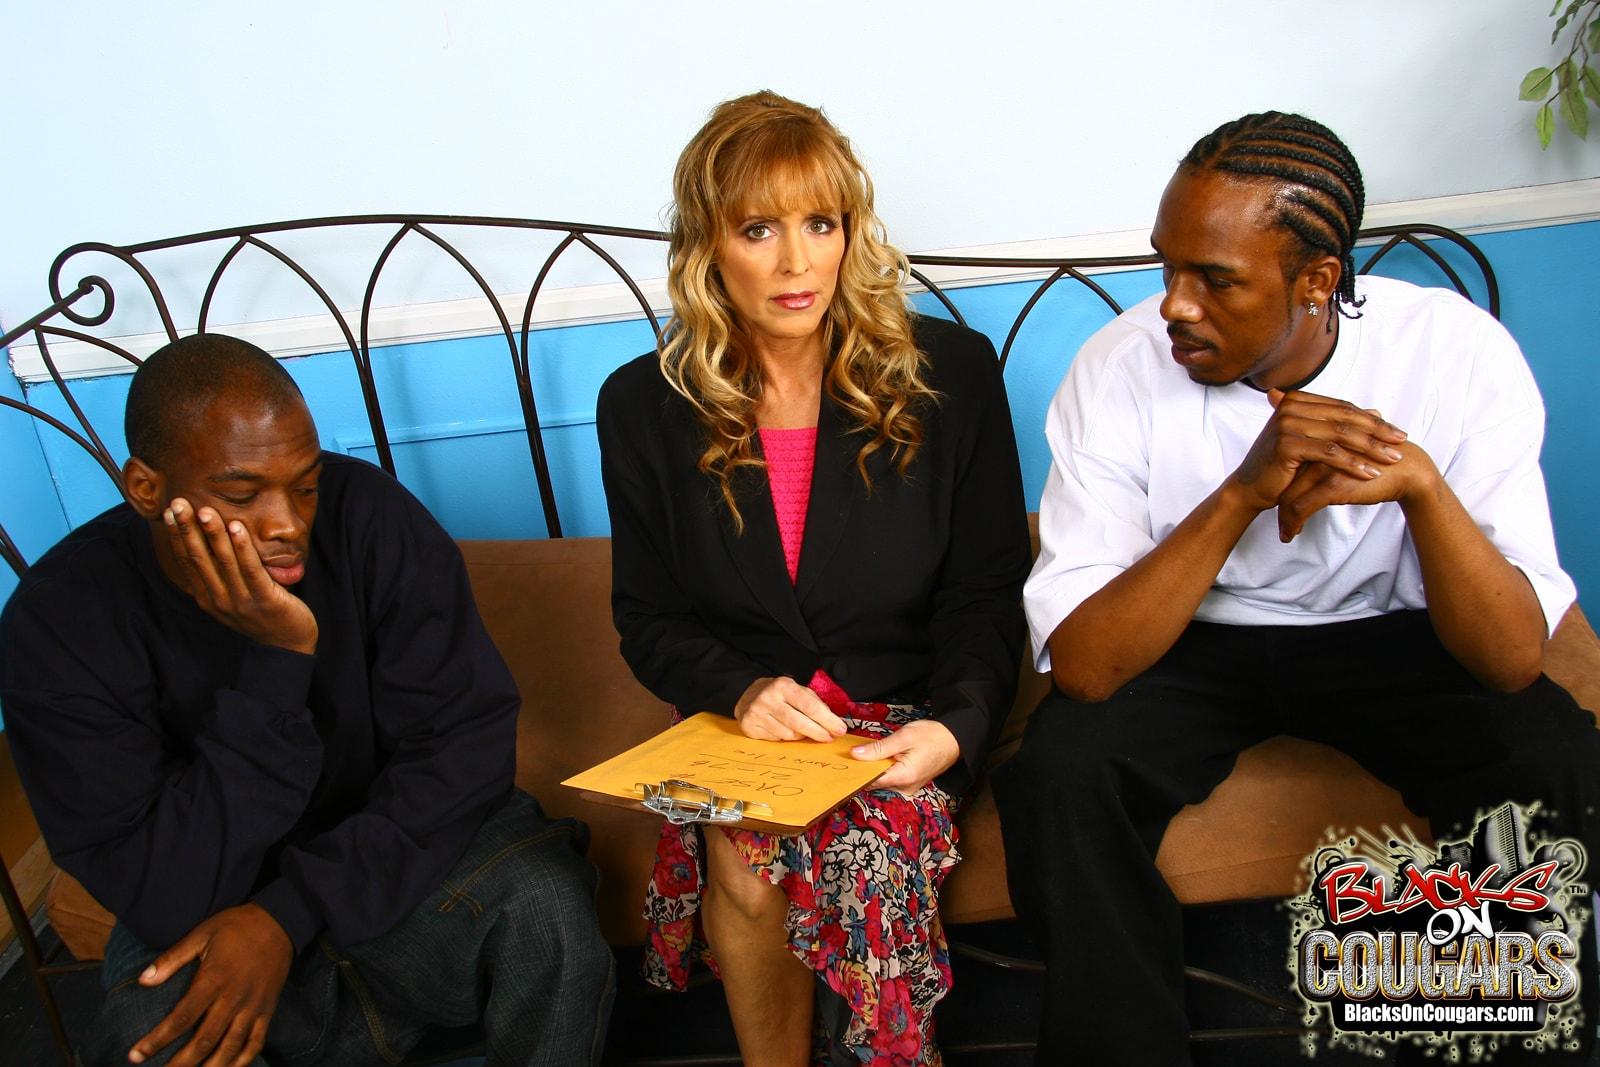 Dogfart '- Blacks On Cougars' starring Nicole Moore (Photo 3)